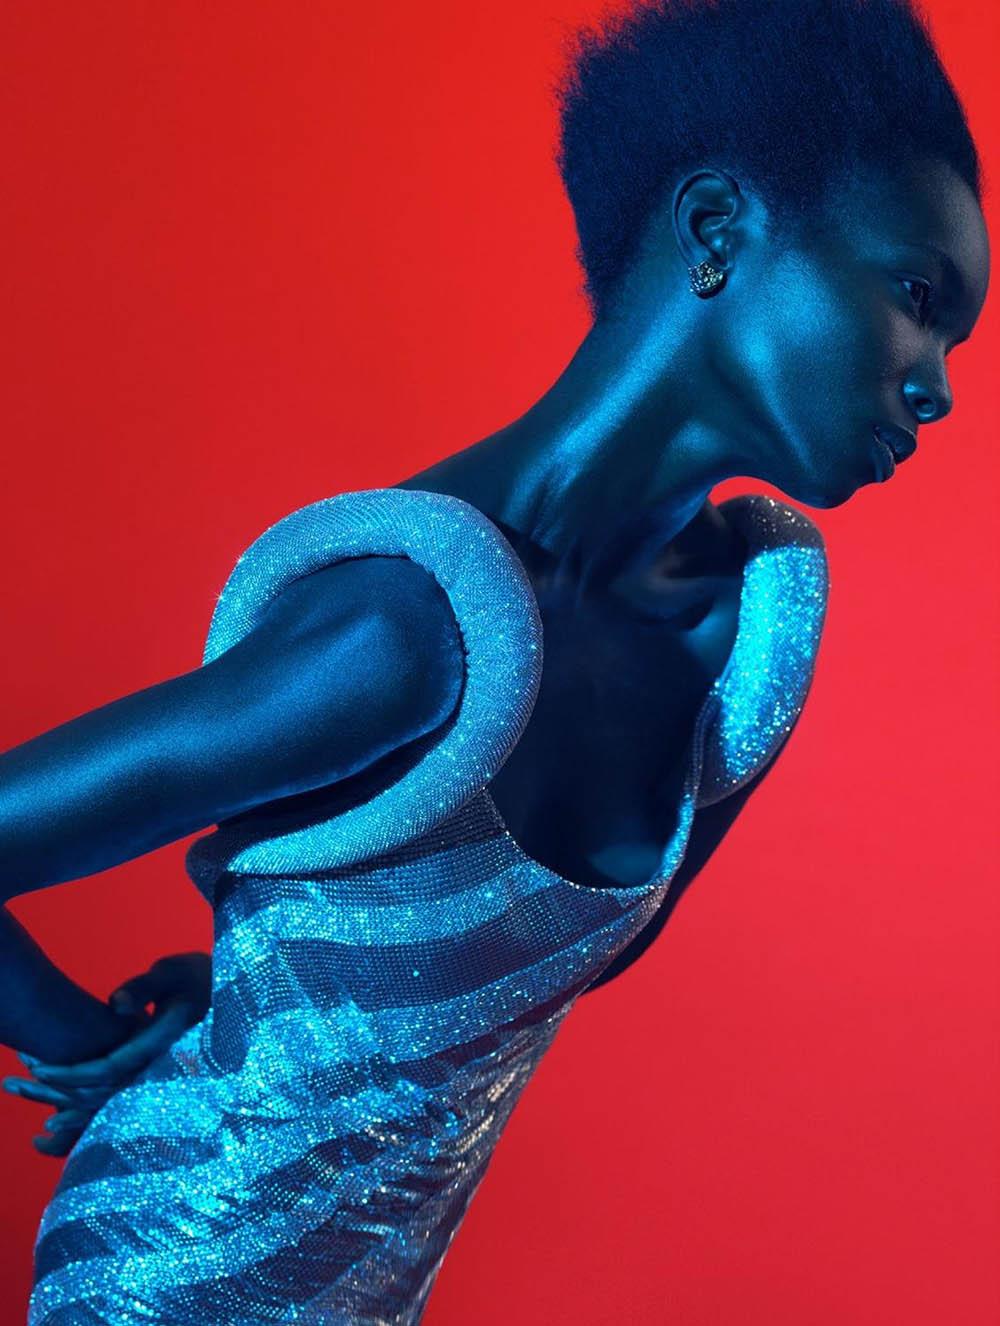 ''United Colors of Modern Beauty'' by Domen & Van de Velde for L'Officiel Italia Issue 34